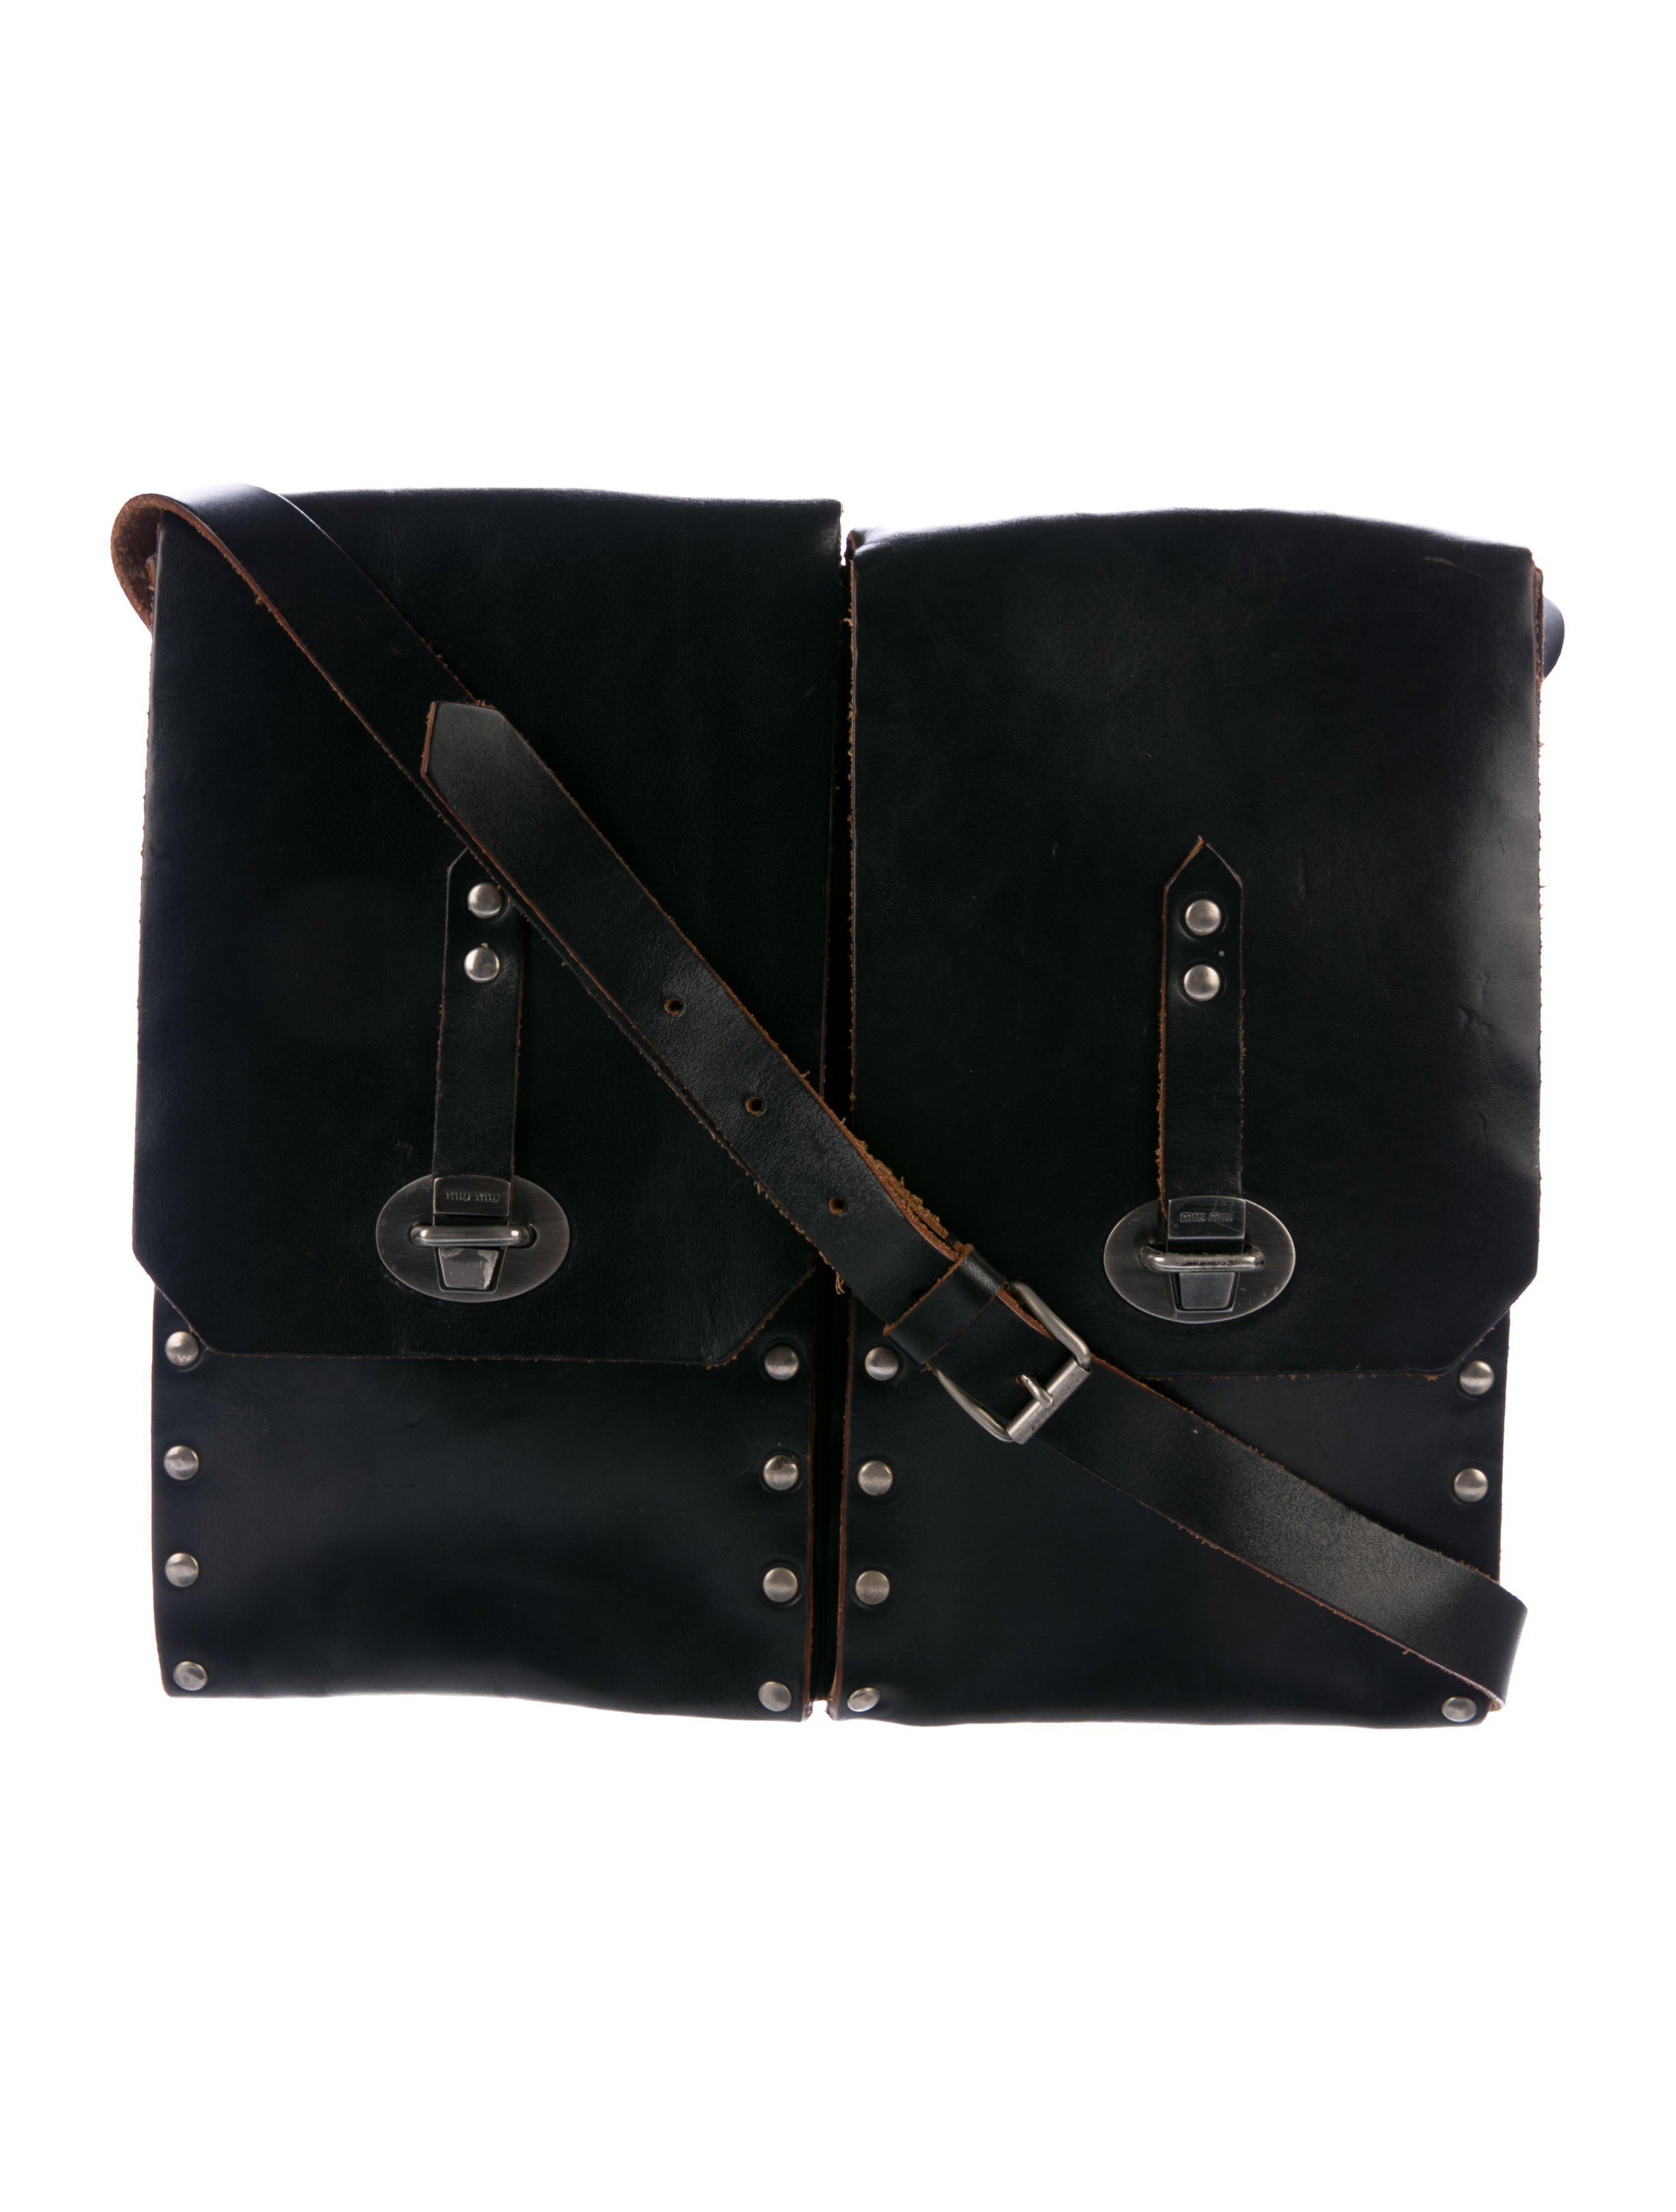 c5811971d66 Miu Miu. Women s Metallic Miu Stud Embellished Leather Crossbody Bag Black